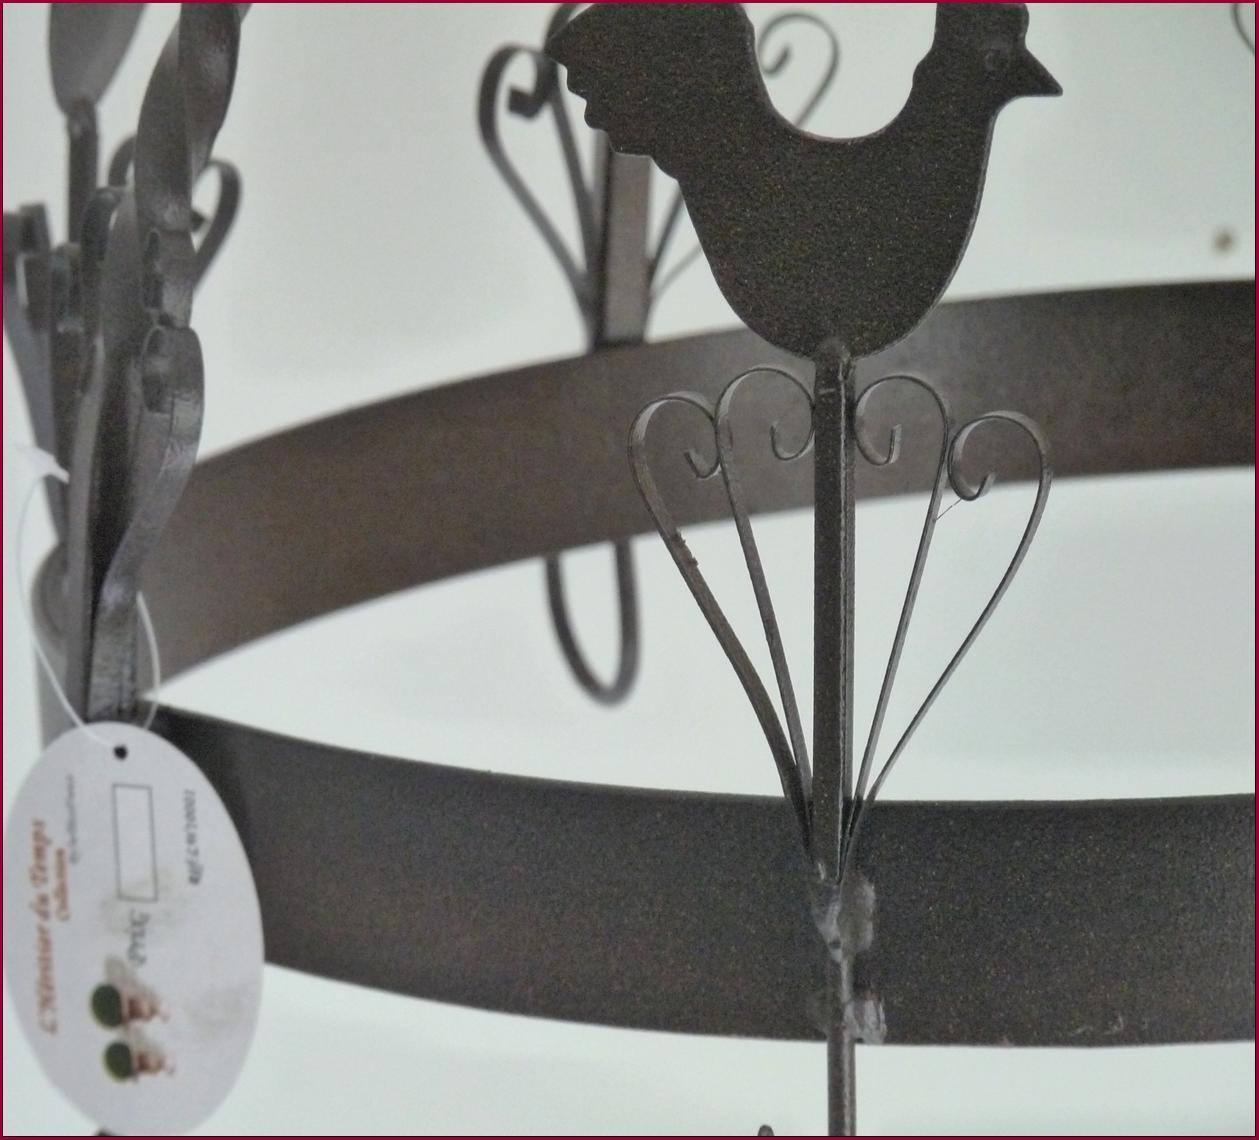 style ancien porte jambon ratelier ustensile casserole etagere de cuisine 27cm ebay. Black Bedroom Furniture Sets. Home Design Ideas